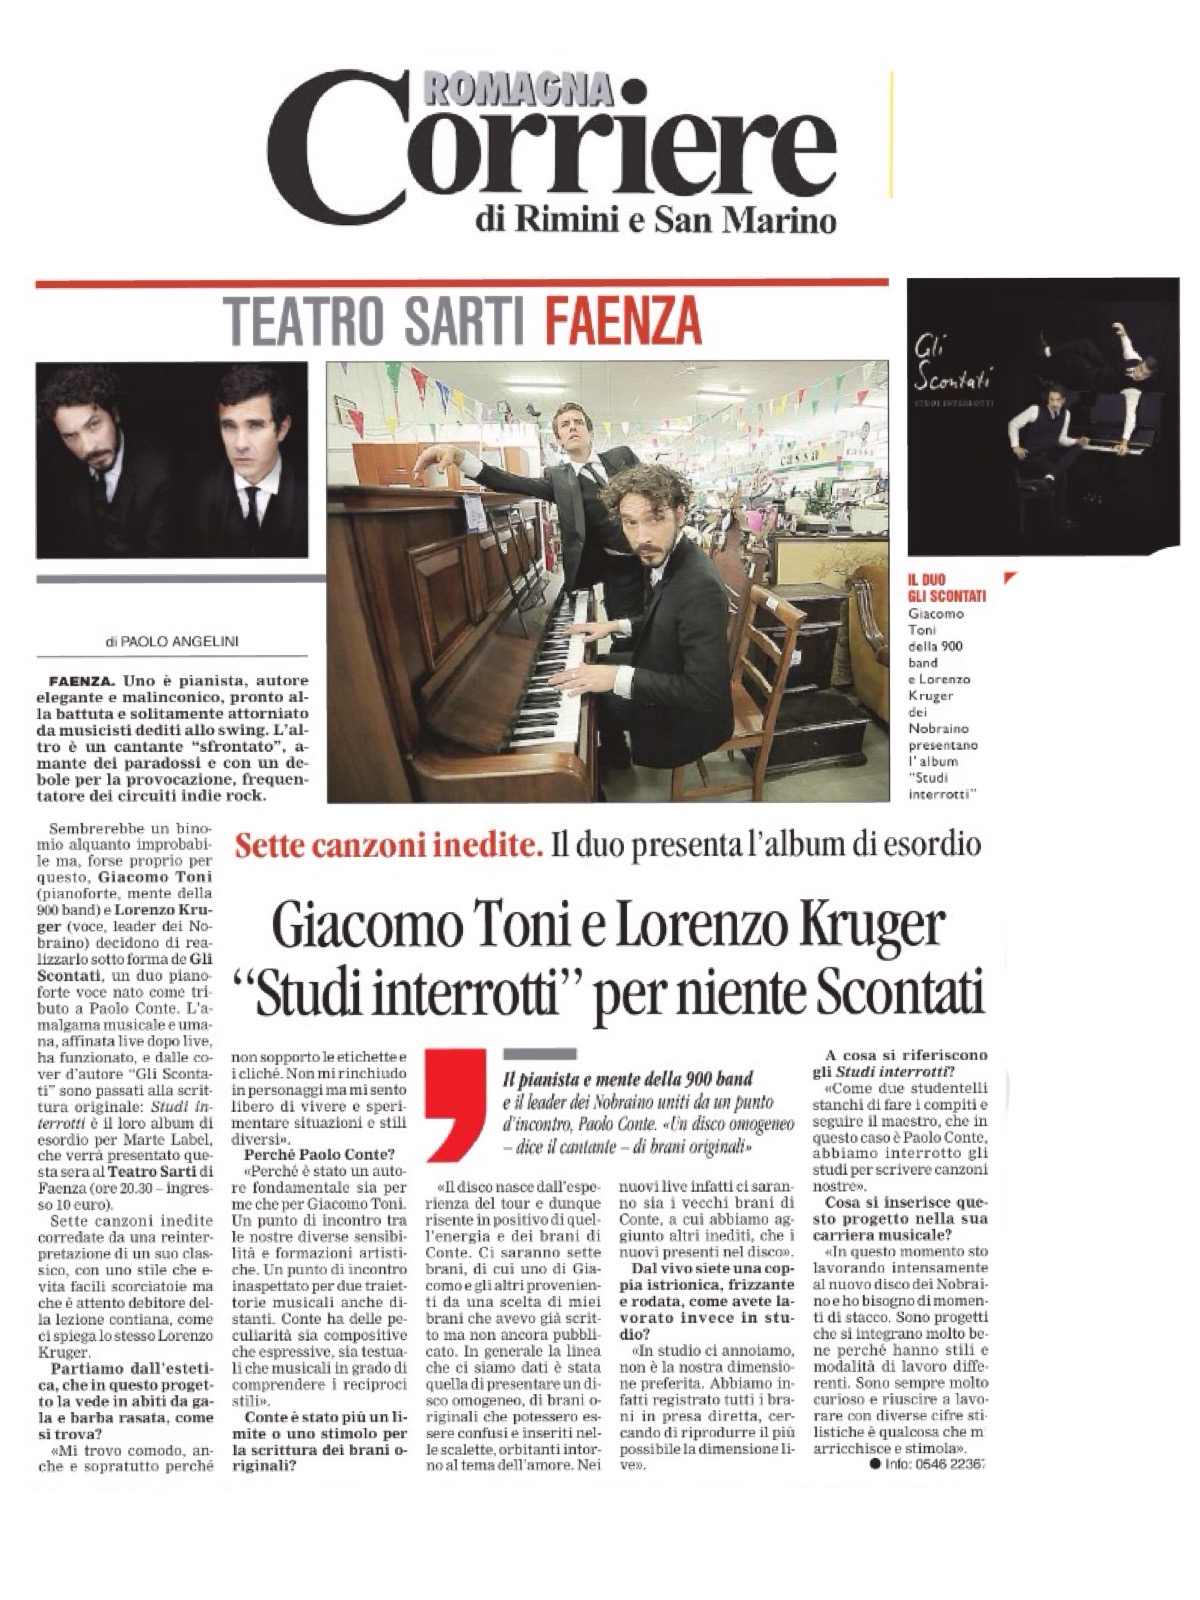 Corriere di Romagna 21.01.2016